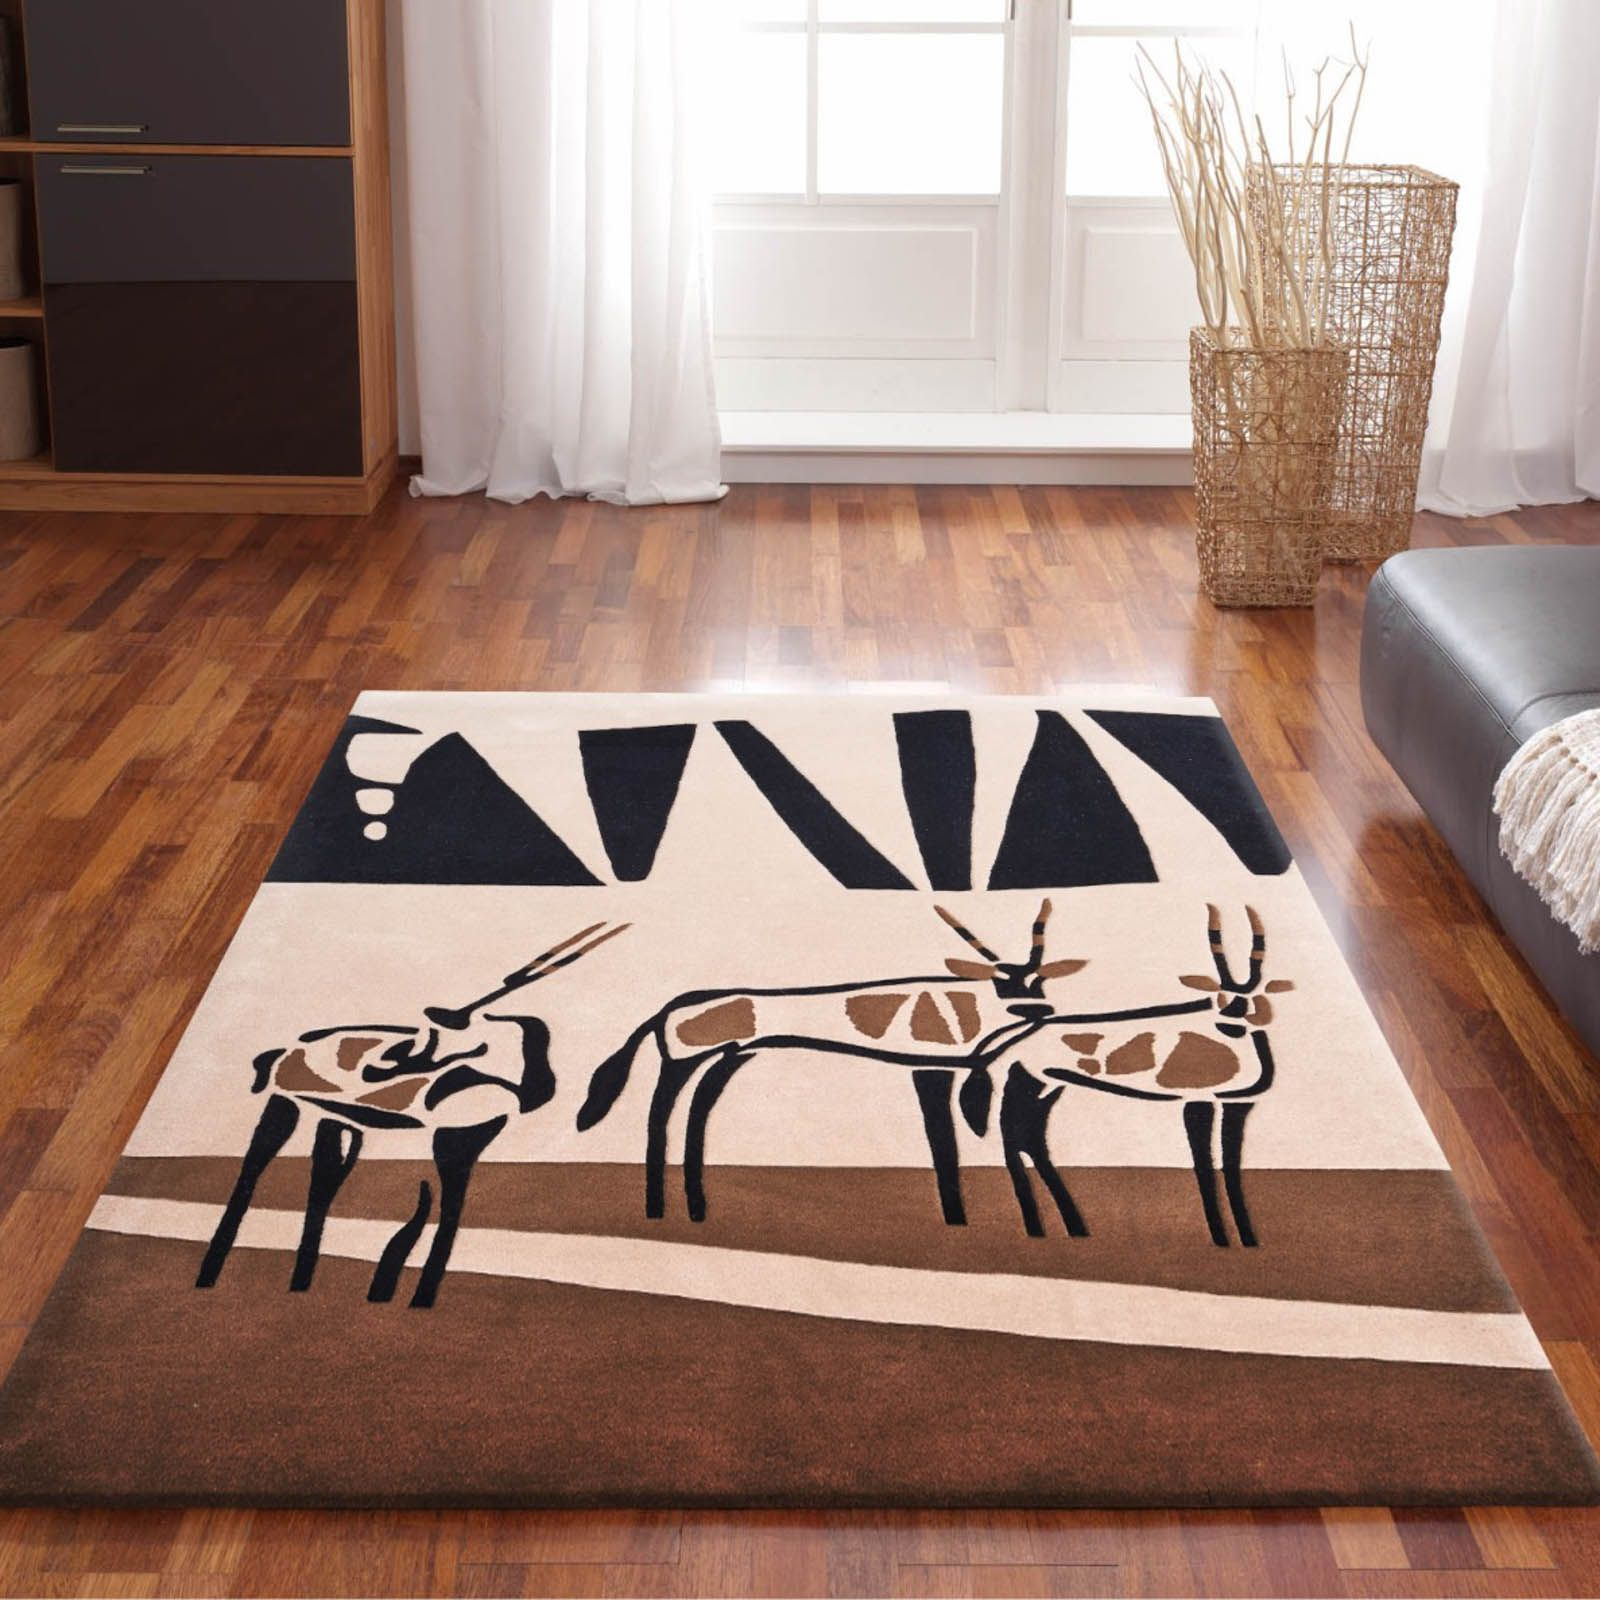 African interior Kalahari rug collection will bring